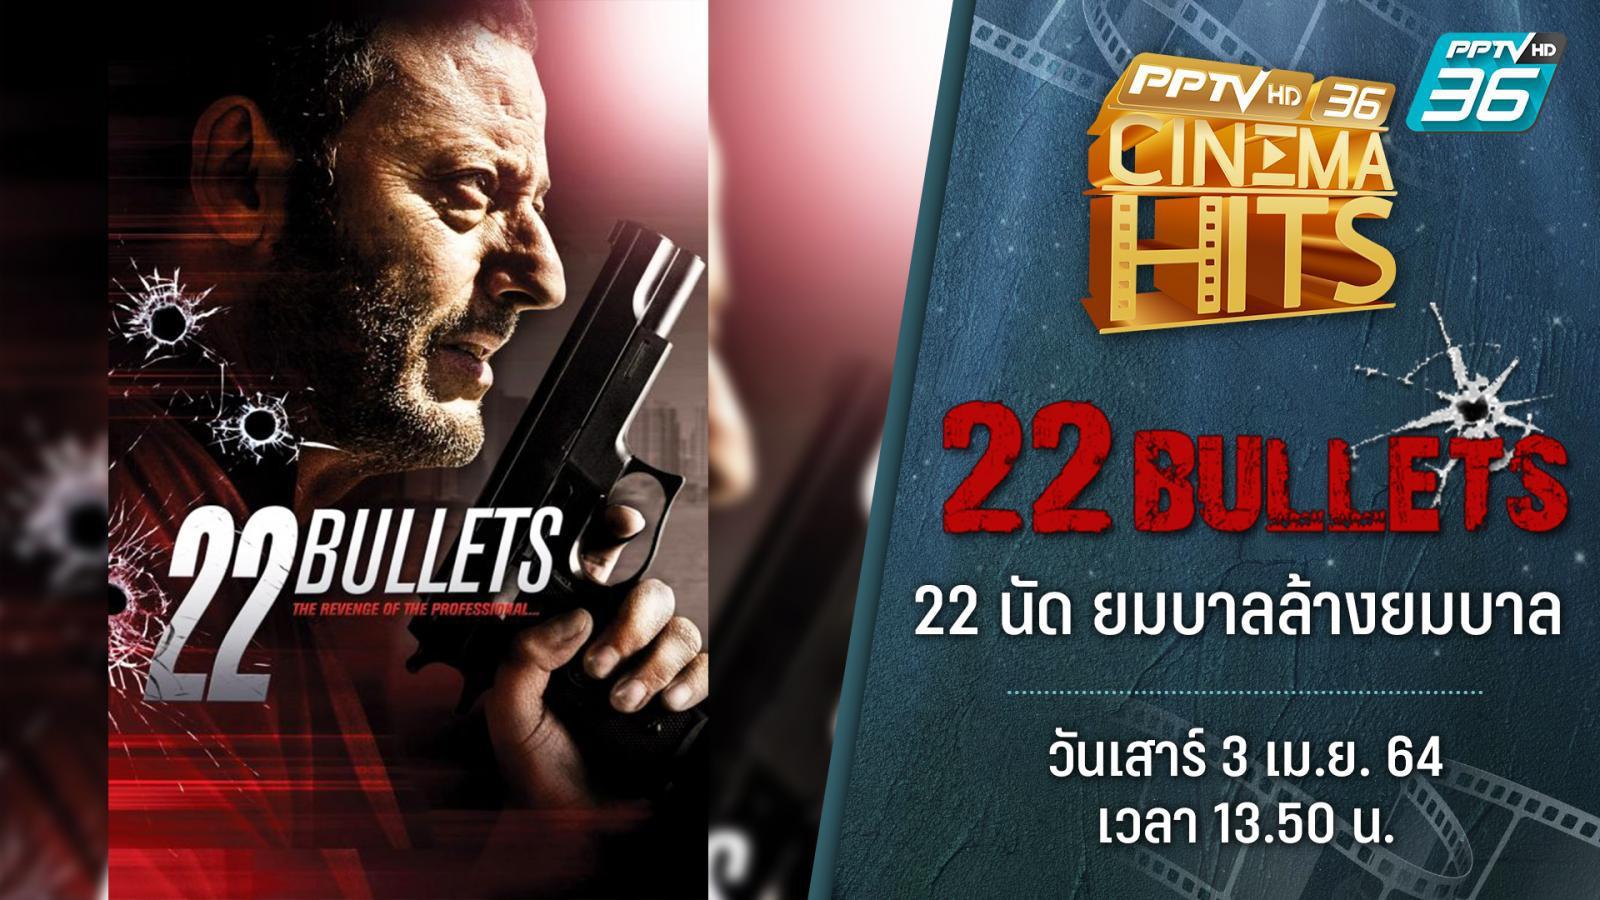 22 Bullets 22 นัด ยมบาลล้างยมบาล